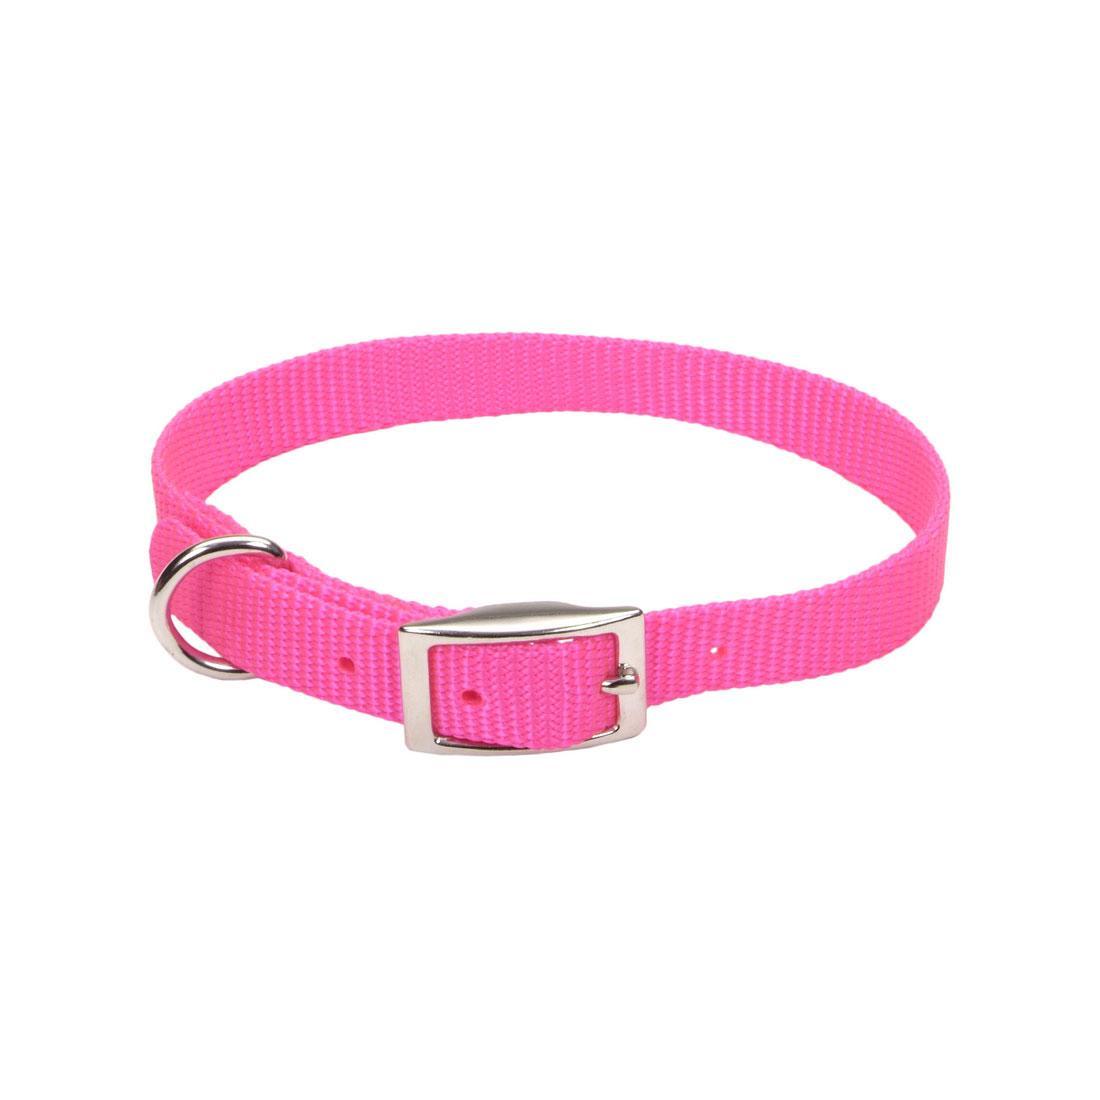 Coastal Single-Ply Dog Collar, Neon Pink, 5/8-in x 16-in